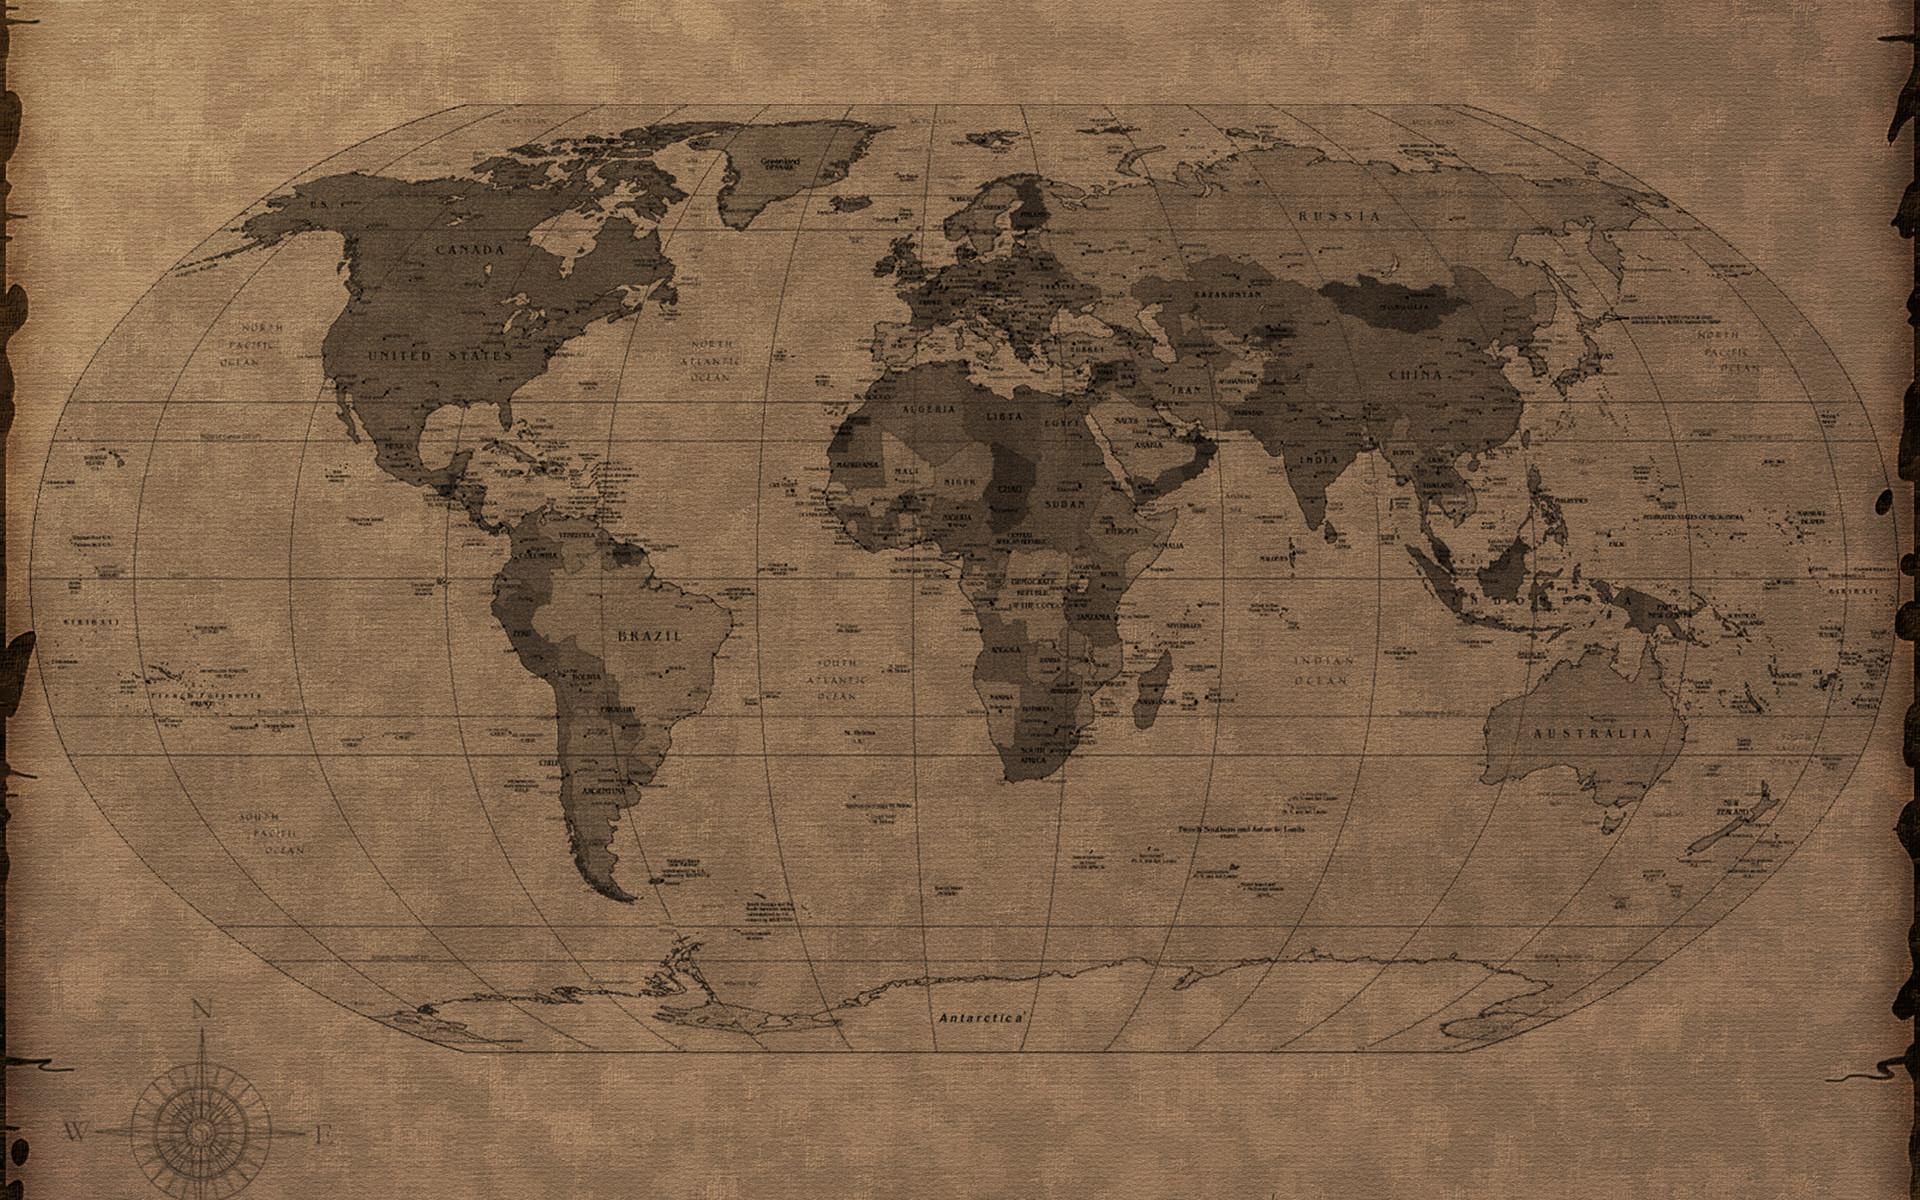 World map desktop wallpaper hd 70 images 1920x1440 country name world map desktop wallpaper download gumiabroncs Choice Image